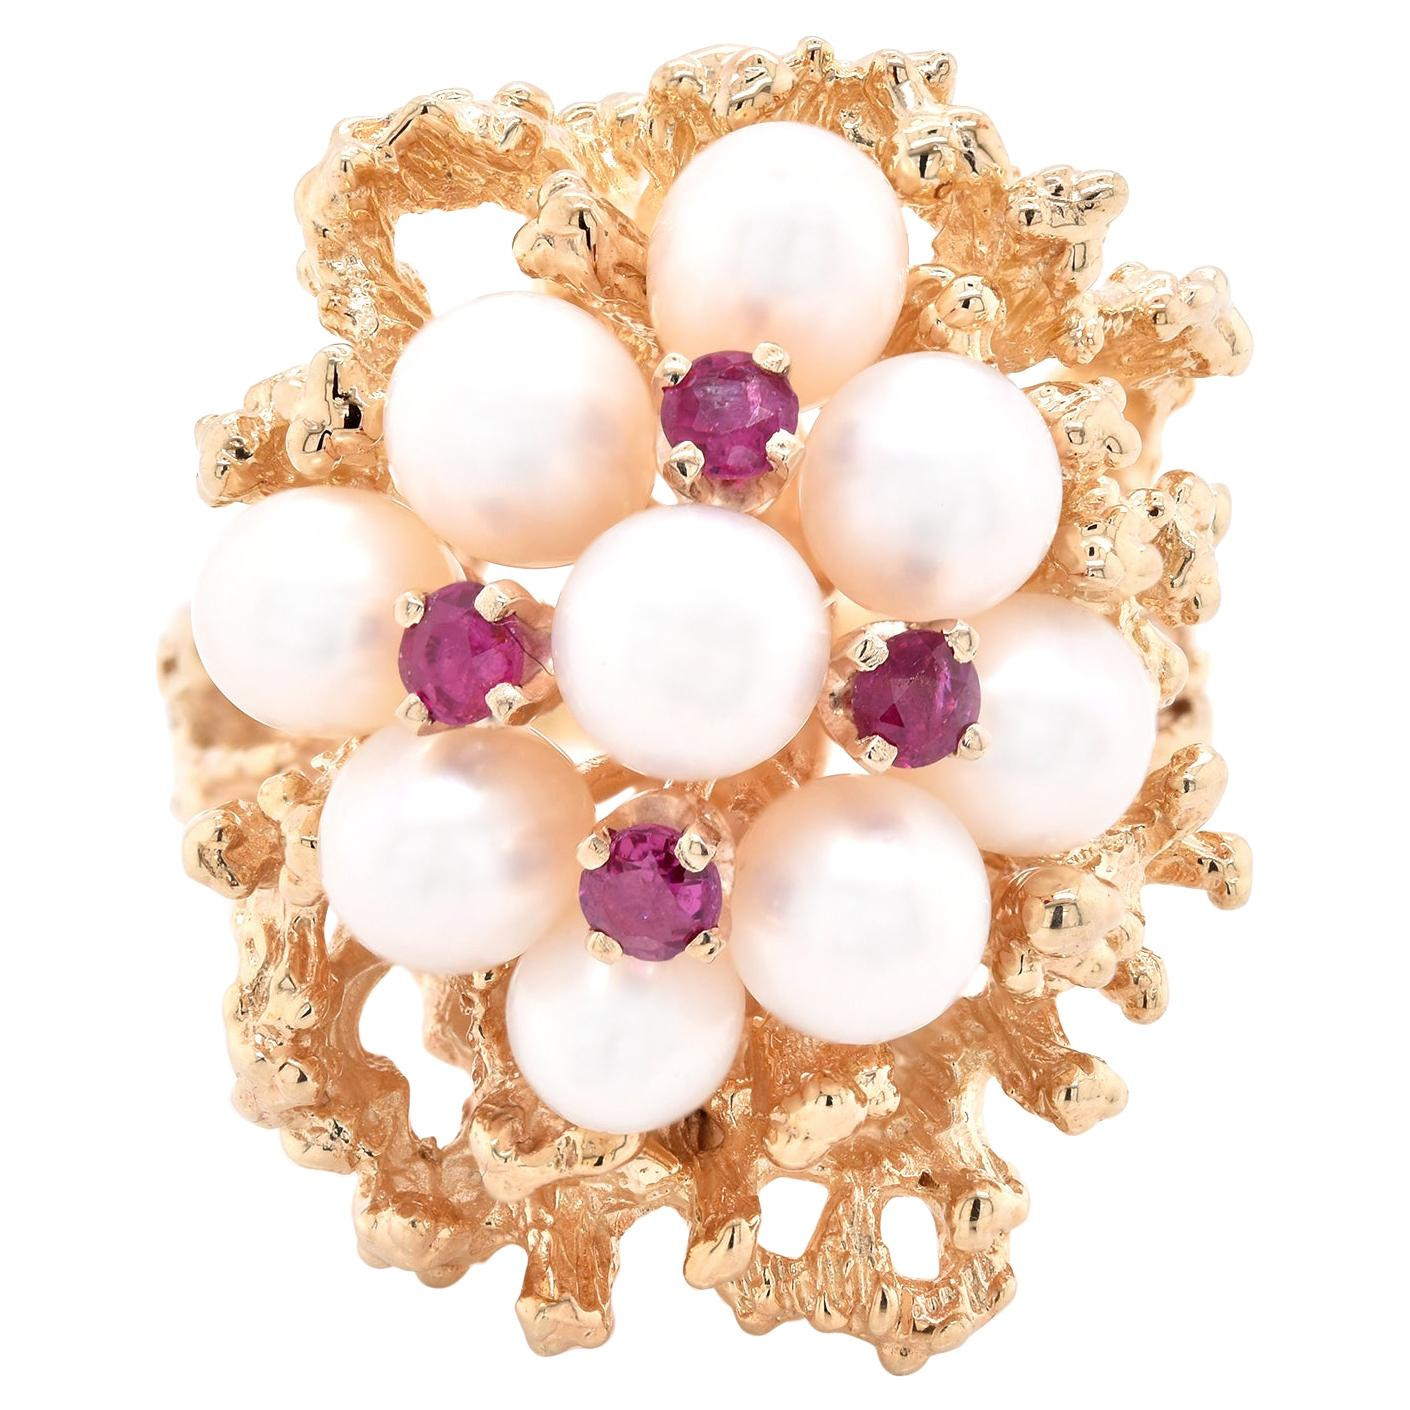 14 Karat Yellow Gold Vintage Pearl and Ruby Freeform Ring